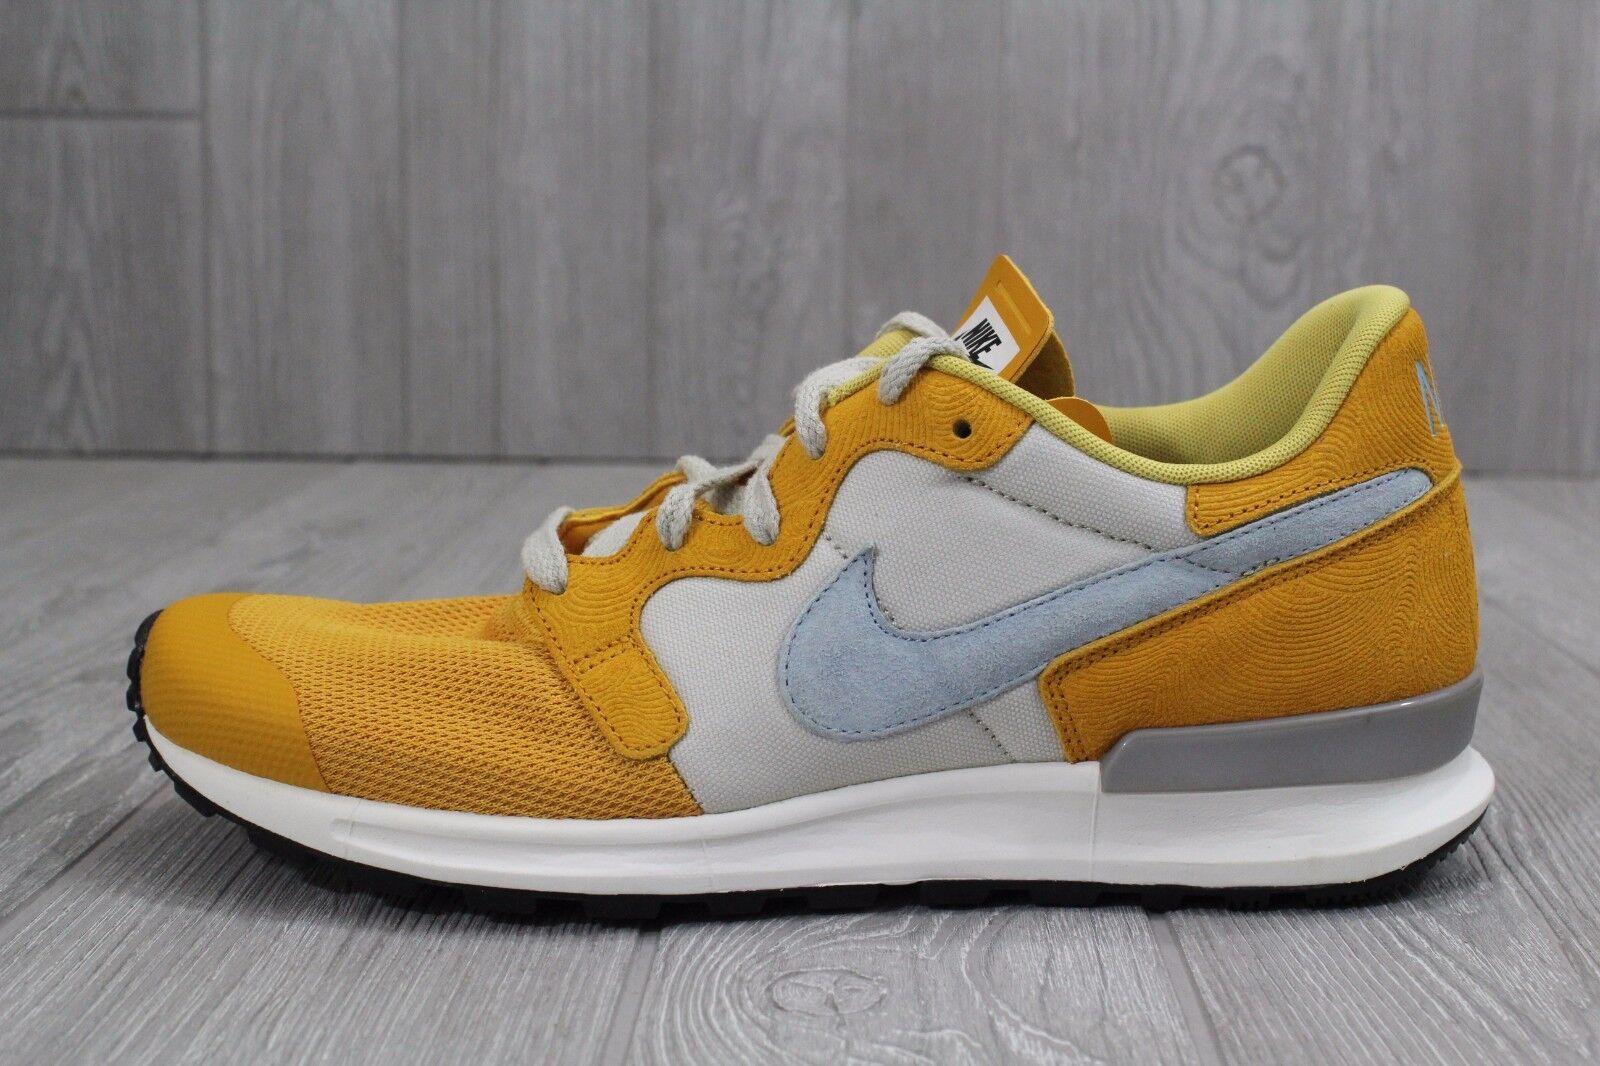 Wild casual shoes 24 New Nike Air Berwuda Premium Gold Leaf Bone Men's Shoe 844978 700 Comfortable